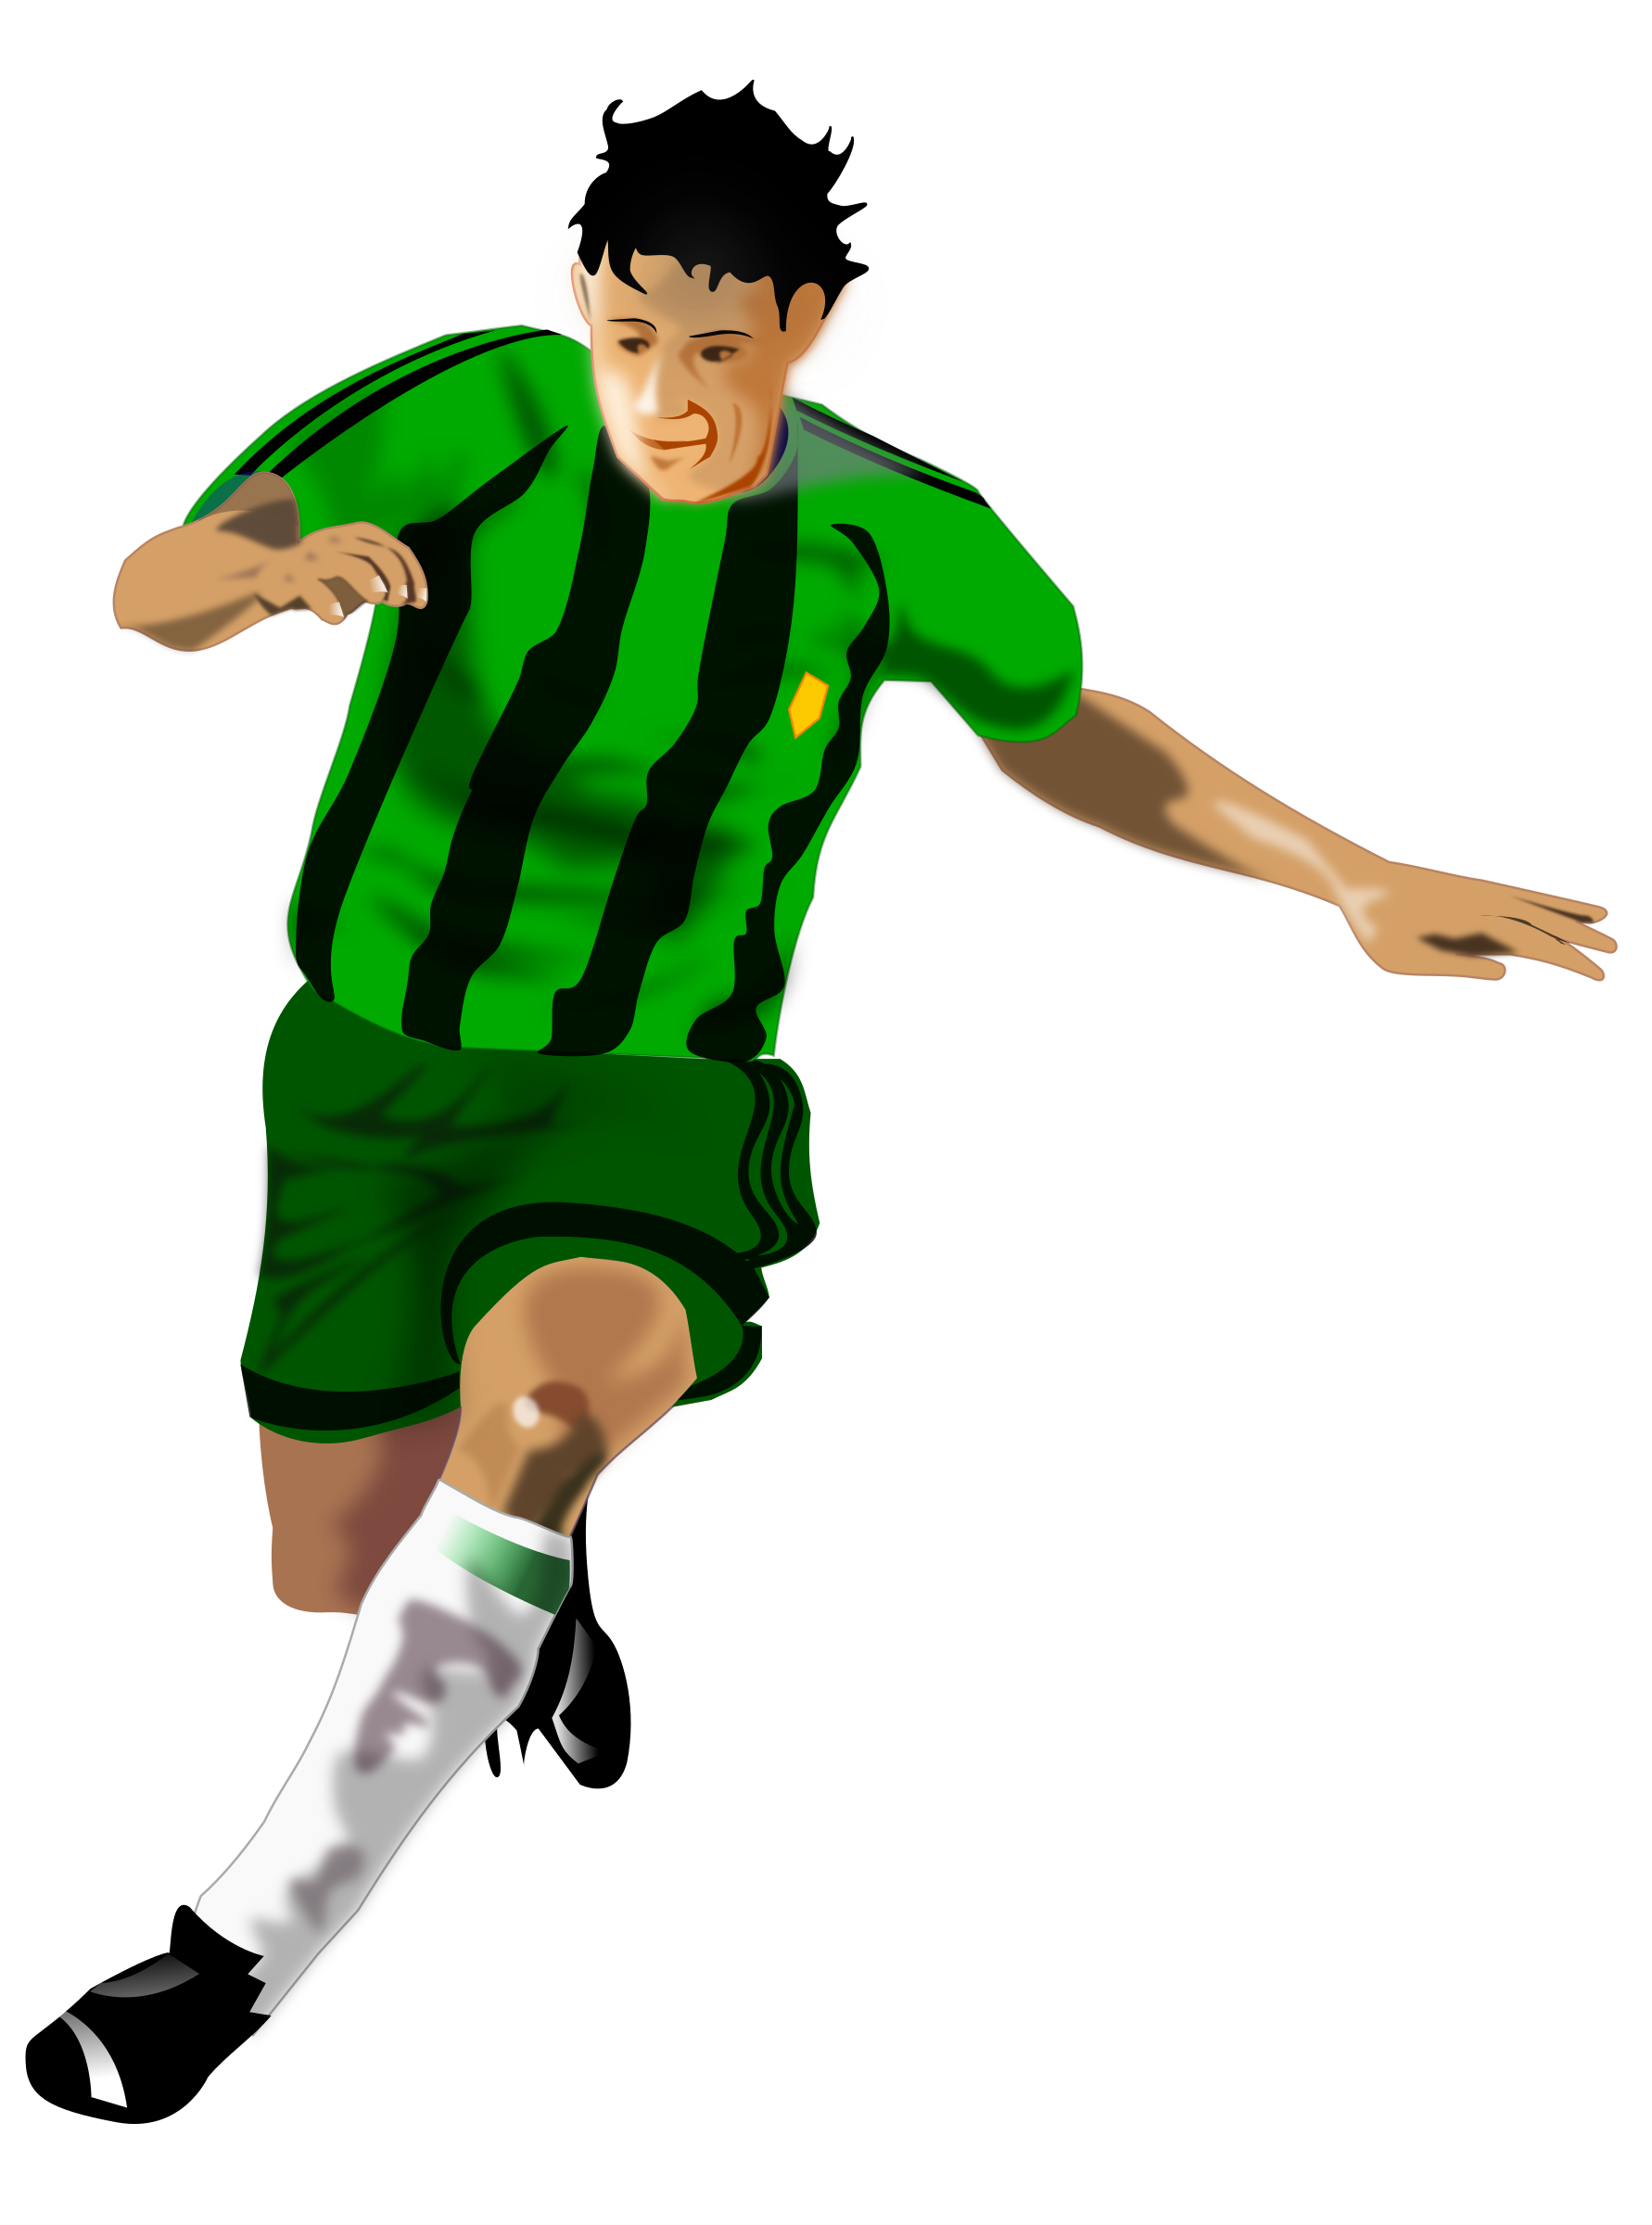 Sports clipart soccer. Player green black big